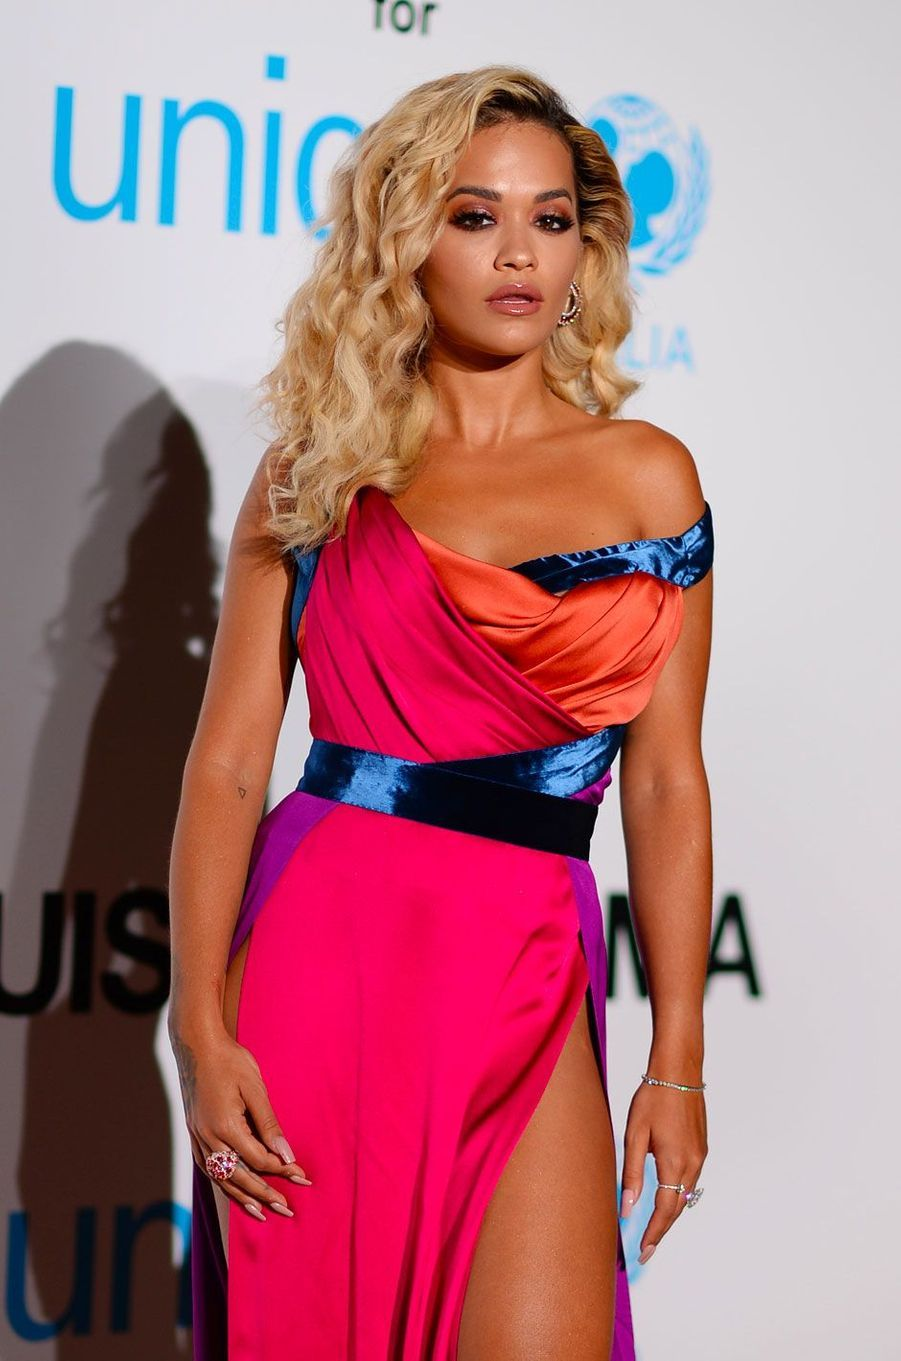 Rita Ora au gala de l'UNICEF à Porto Cervo (Sardaigne) le 10 août 2018